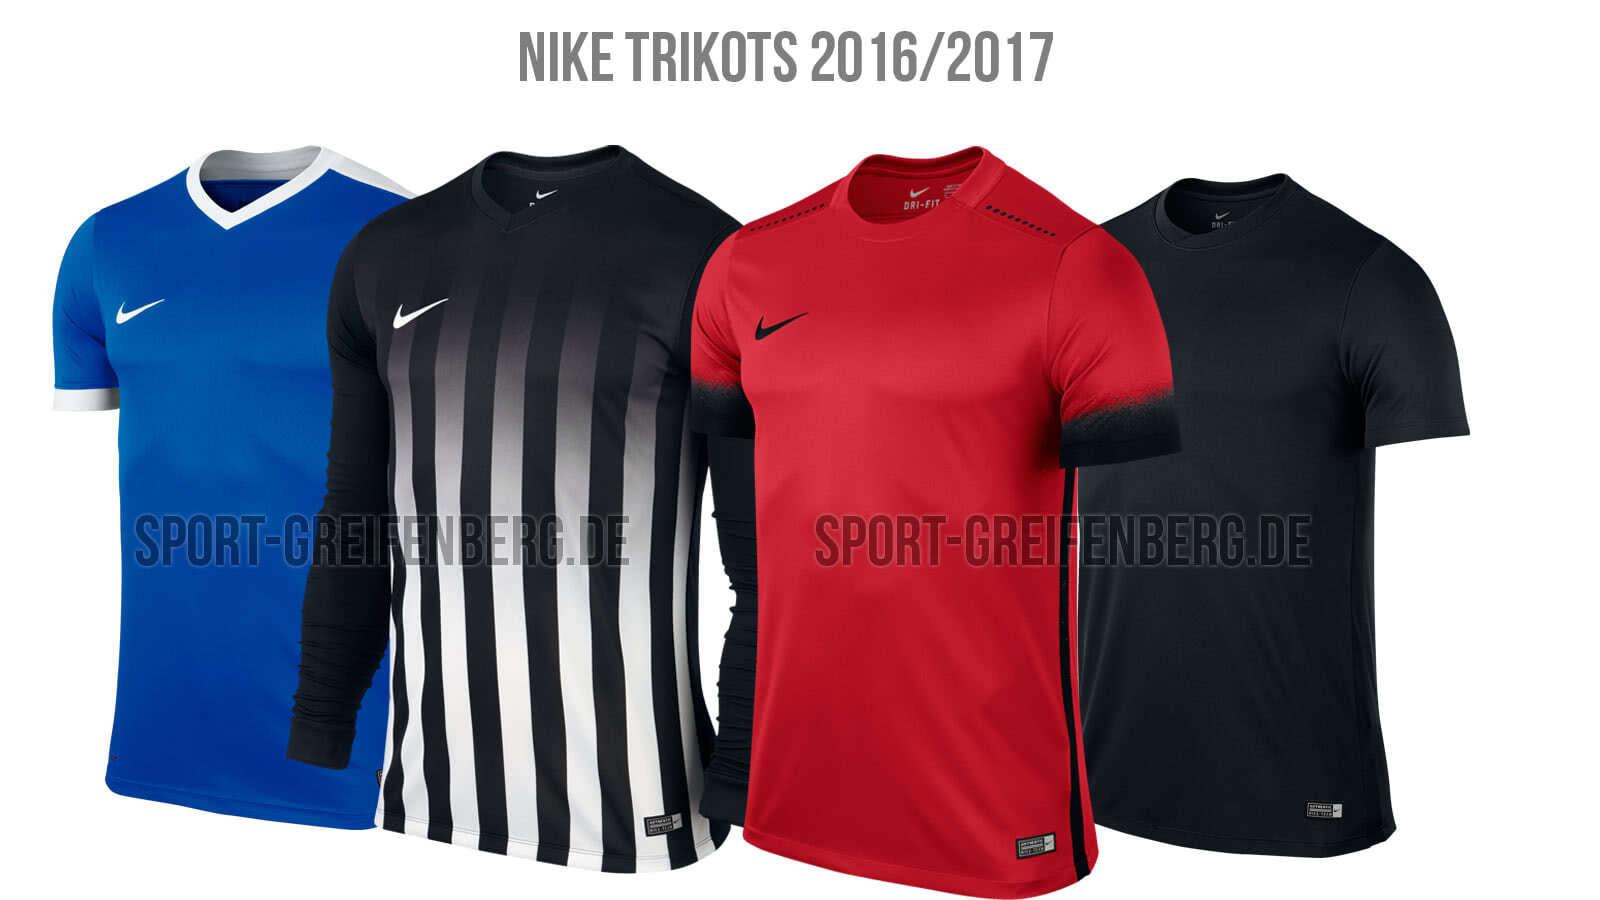 sale usa online sale super popular Nike Trikots 2016/2017 Katalog - Sportartikel und ...